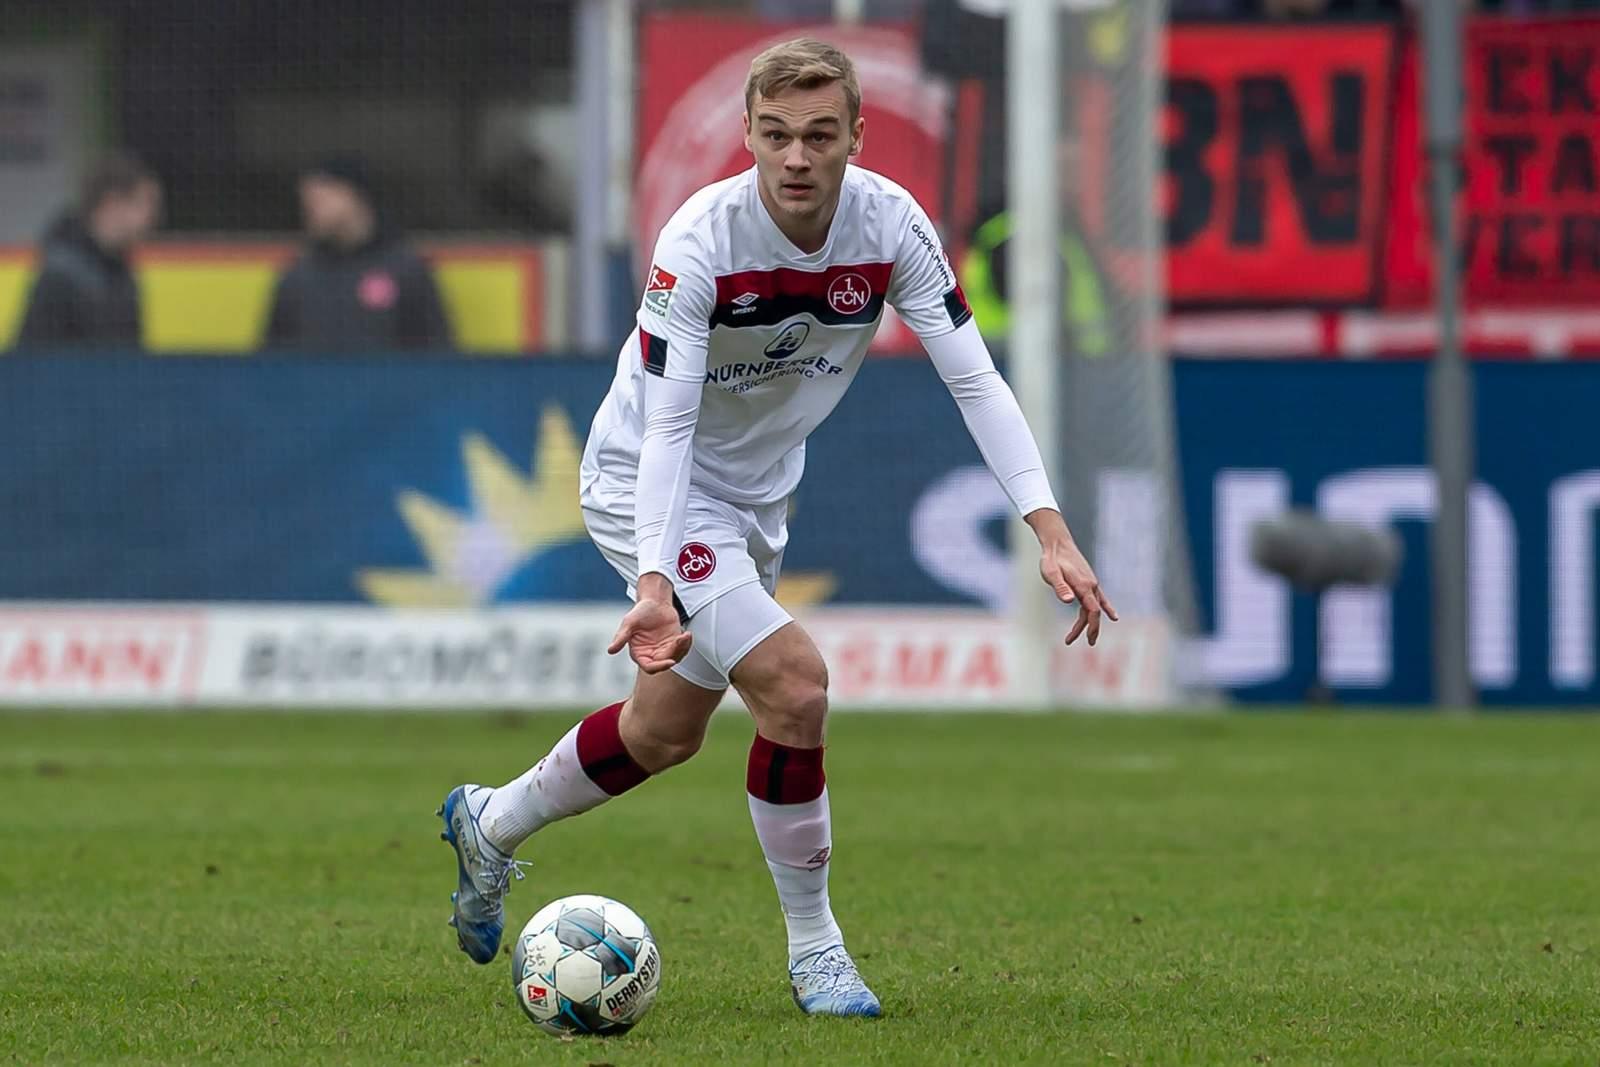 Tim handwerker vom 1. FC Nürnberg